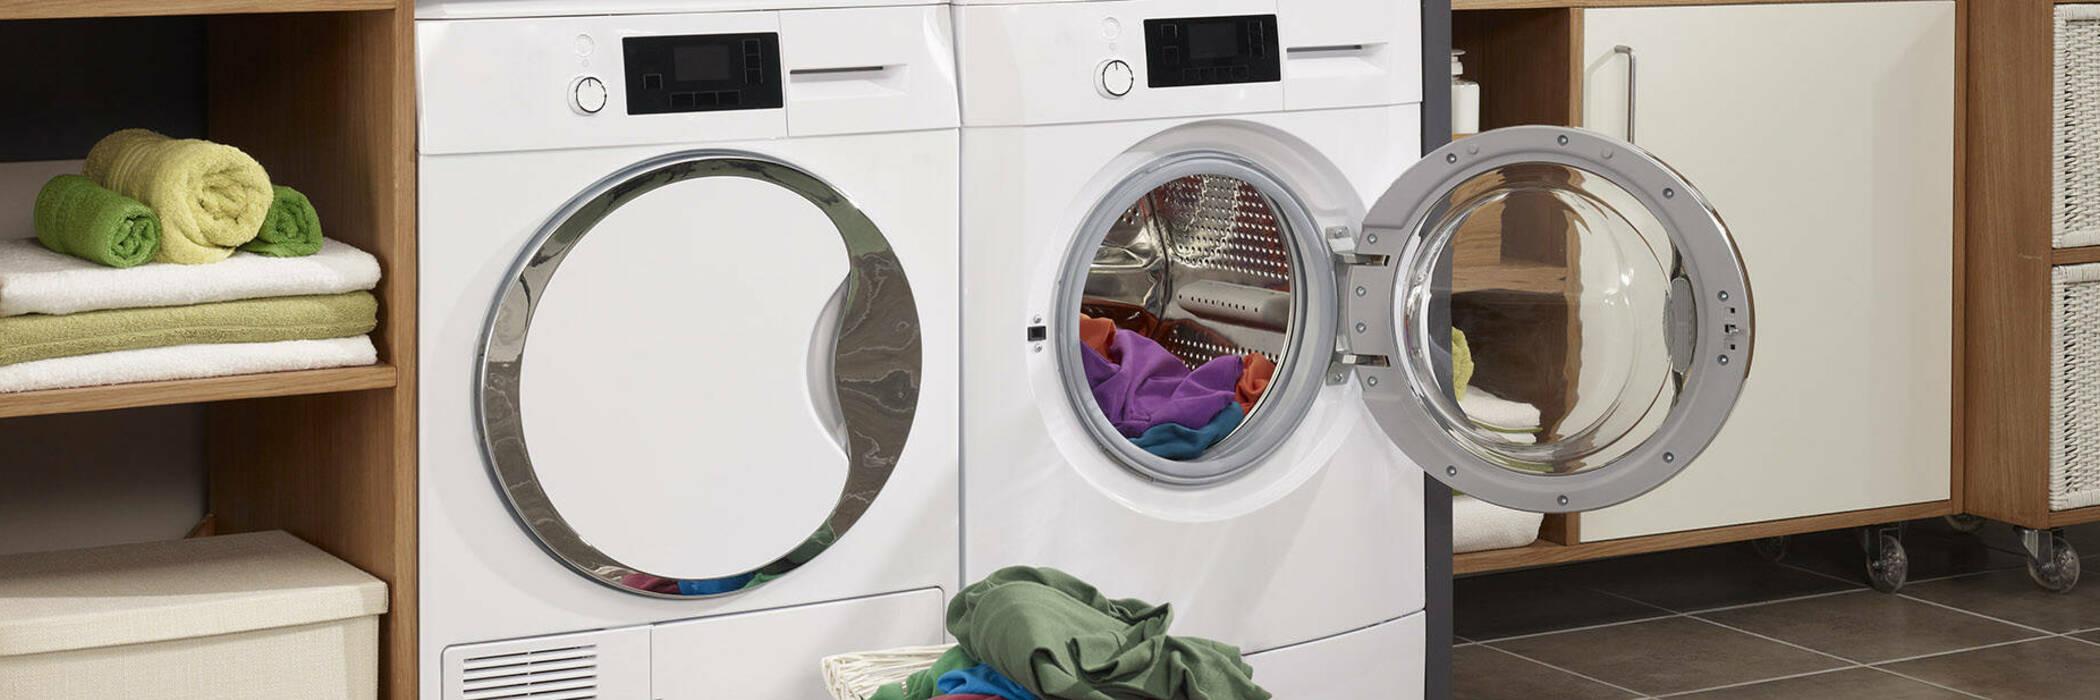 17jun clothes dryers hero